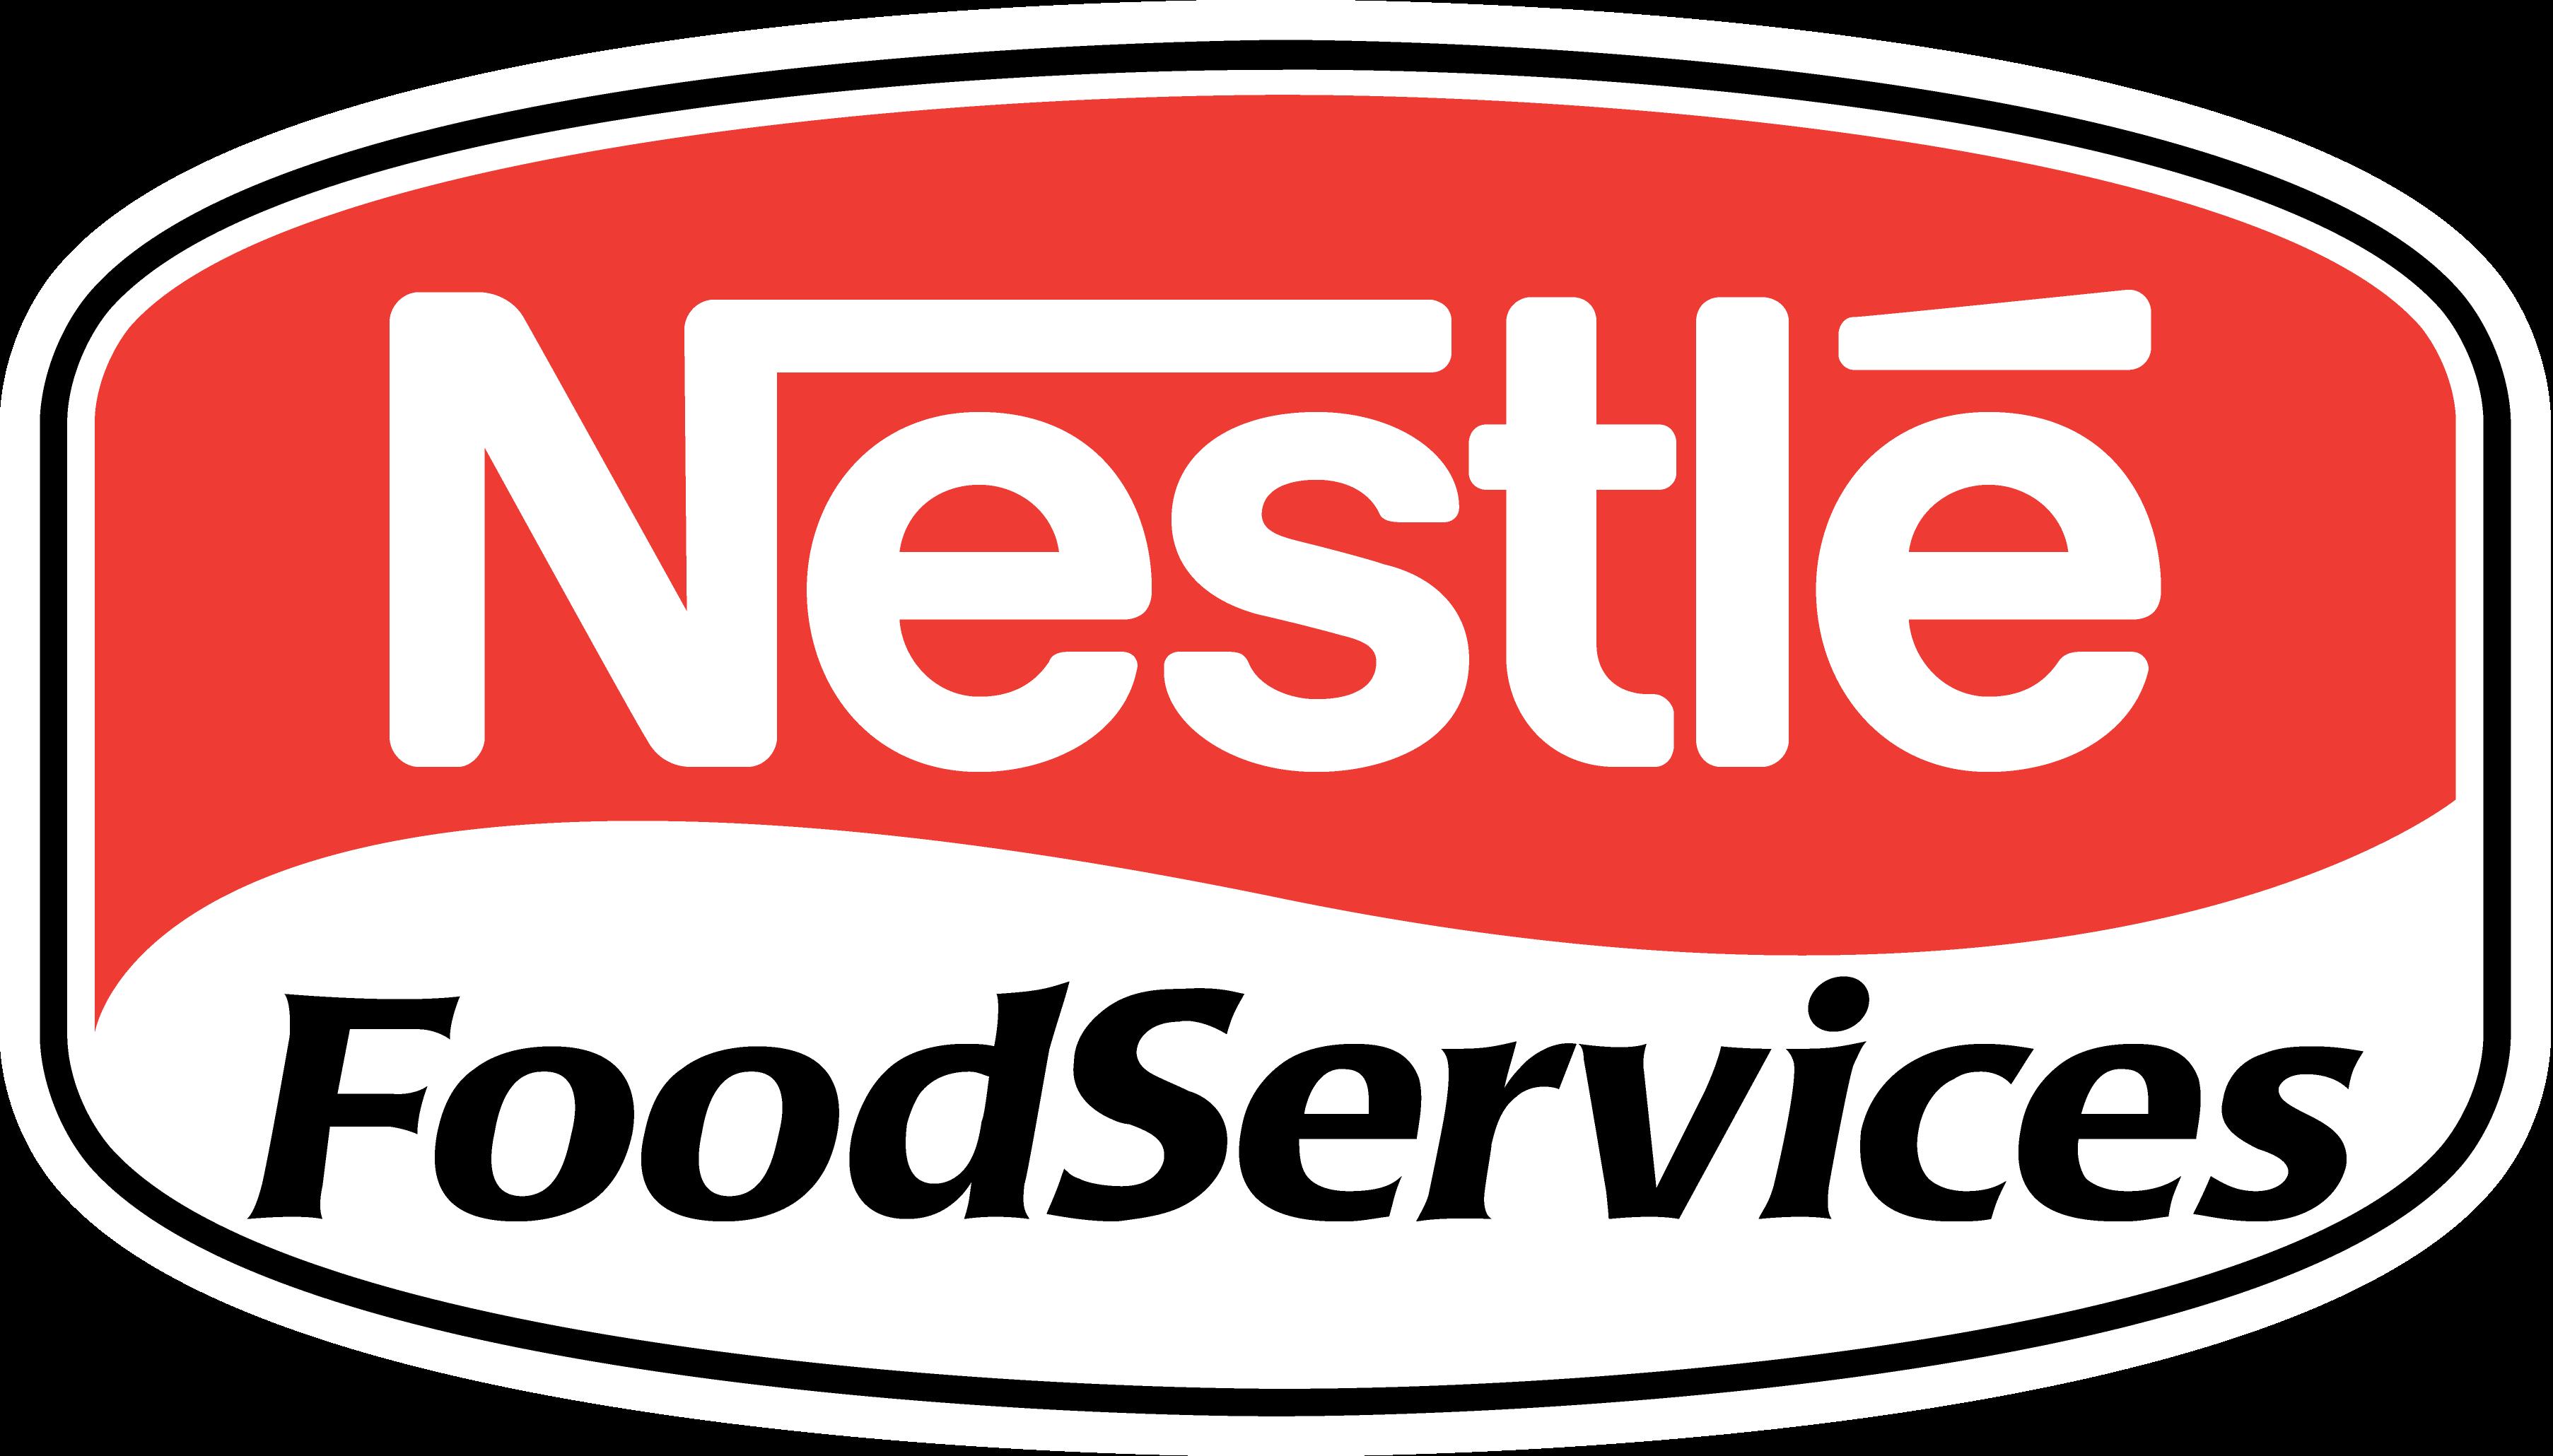 Nestle Food Services Logos Pinterest Food service